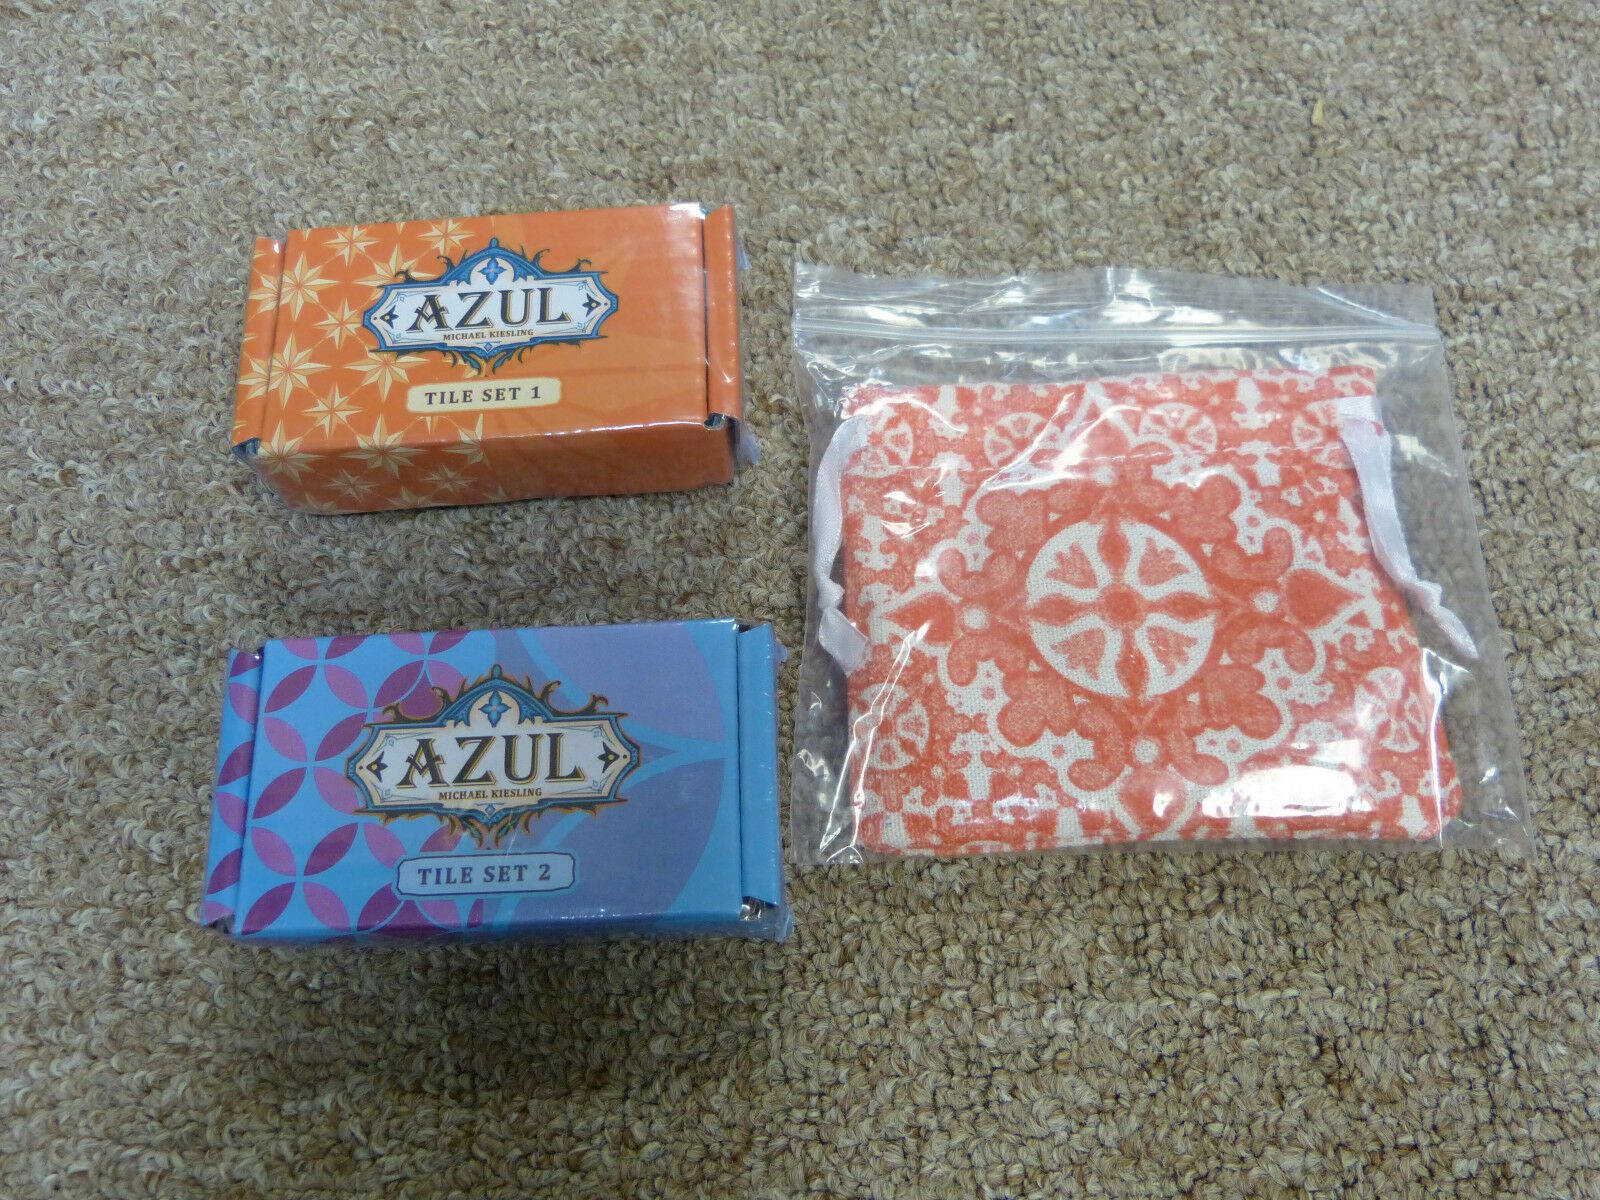 azul Joker Tiles, and rojo & azul Collector Tile Sets - NEW